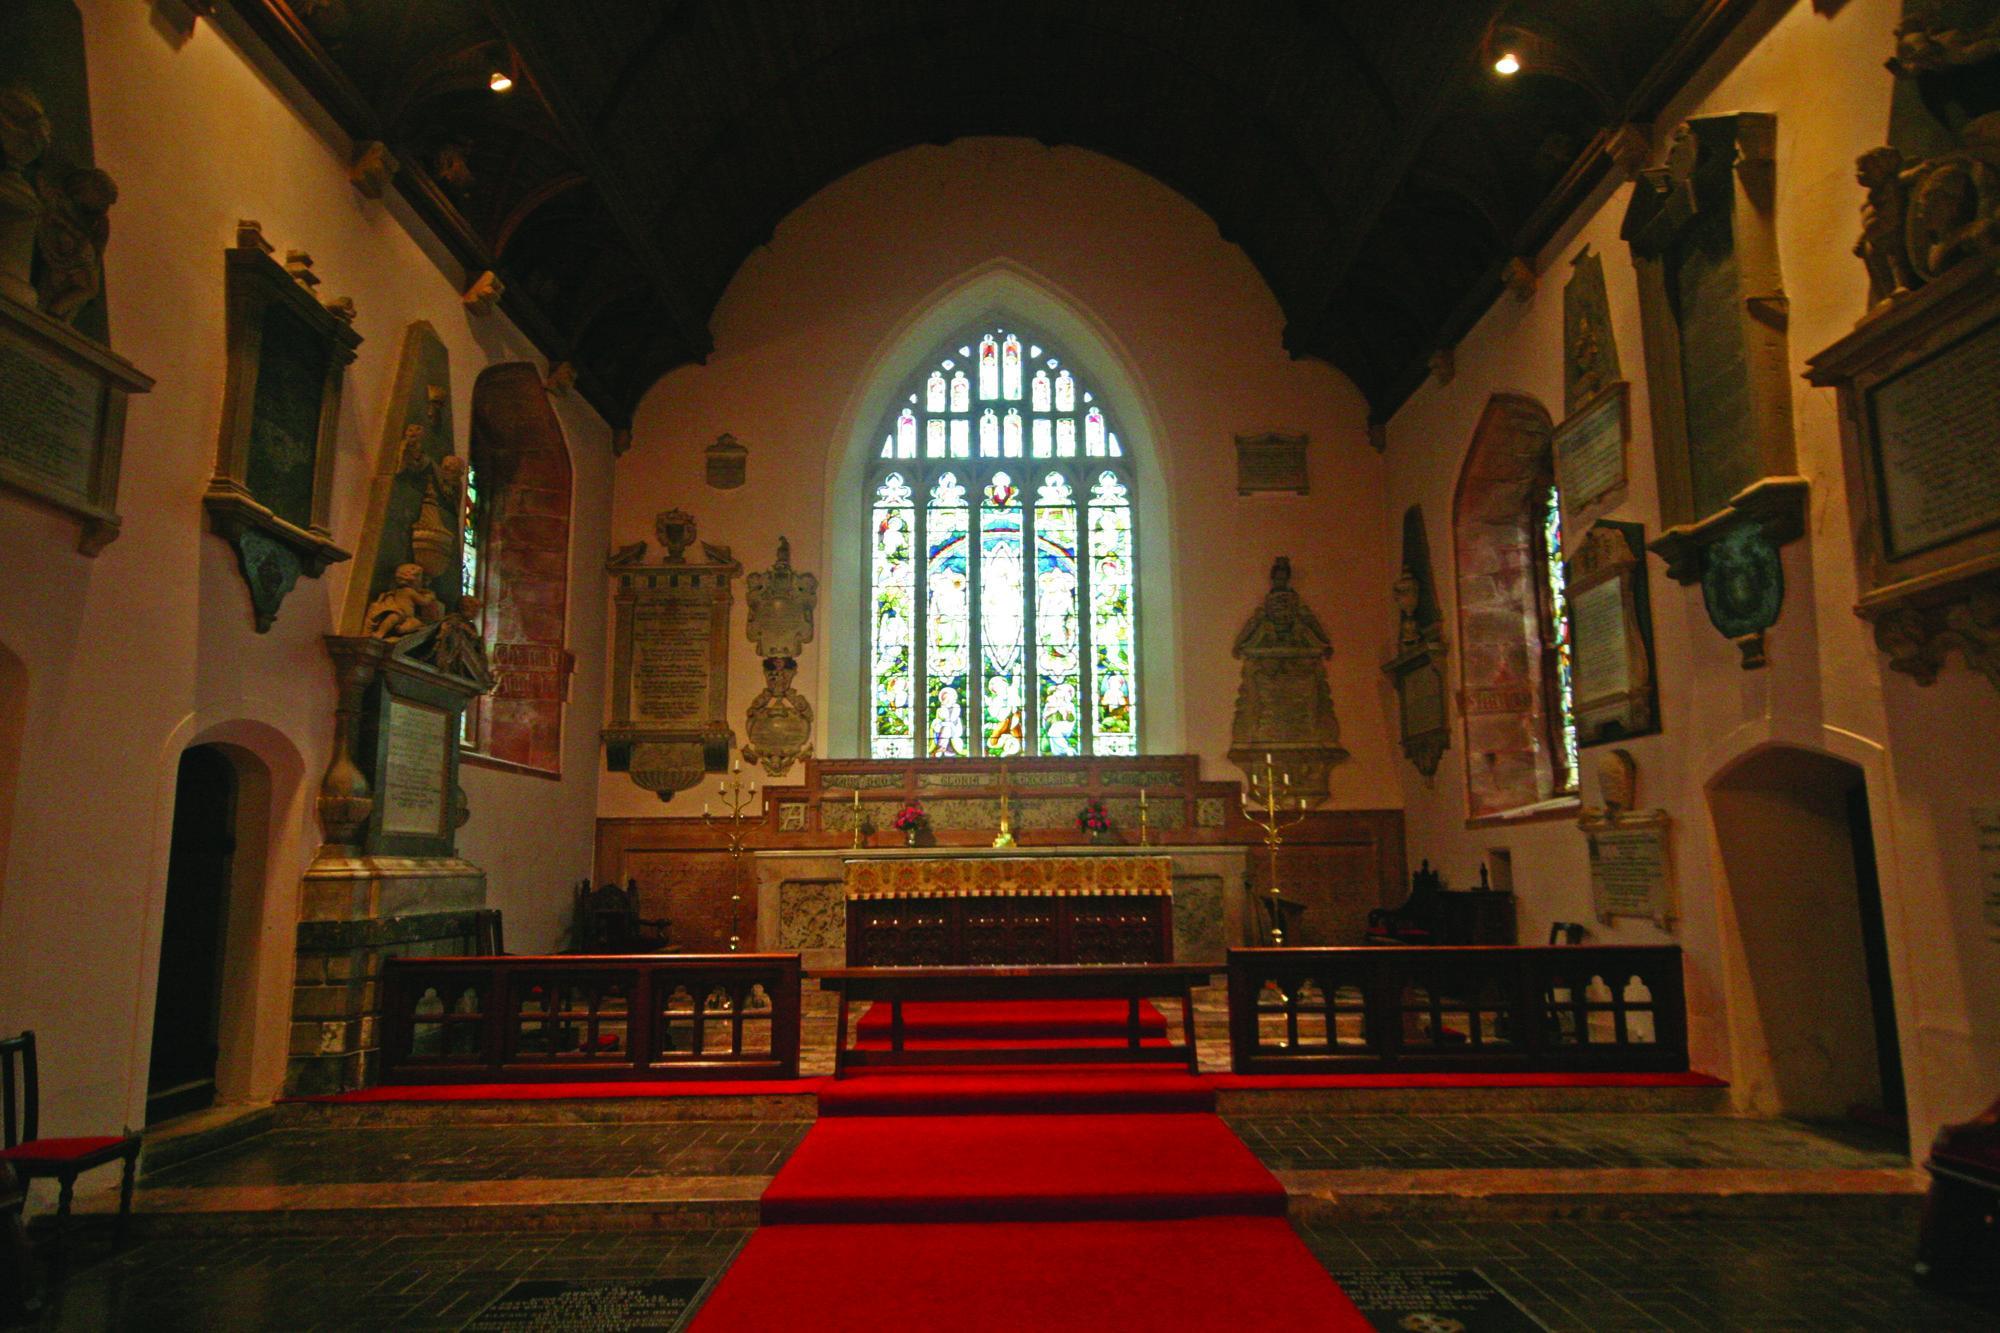 St Padarn's, Llanbadarn Fawr